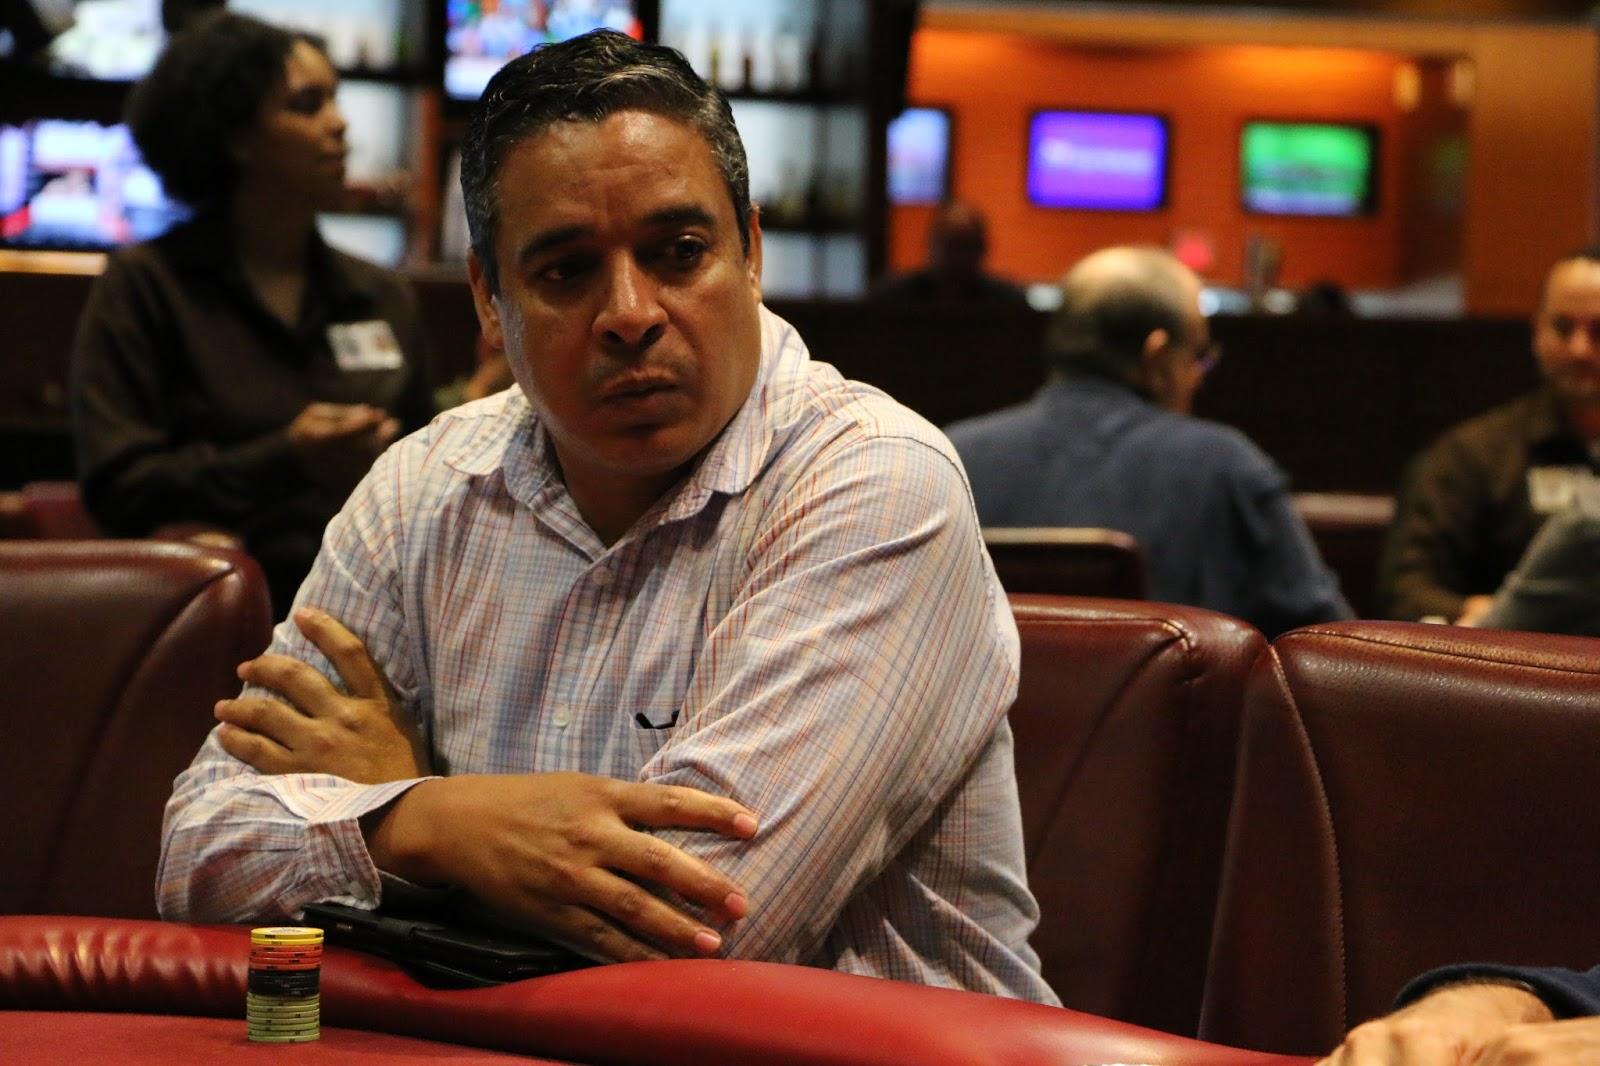 James hamburger poker uk gambling commission fee calculator